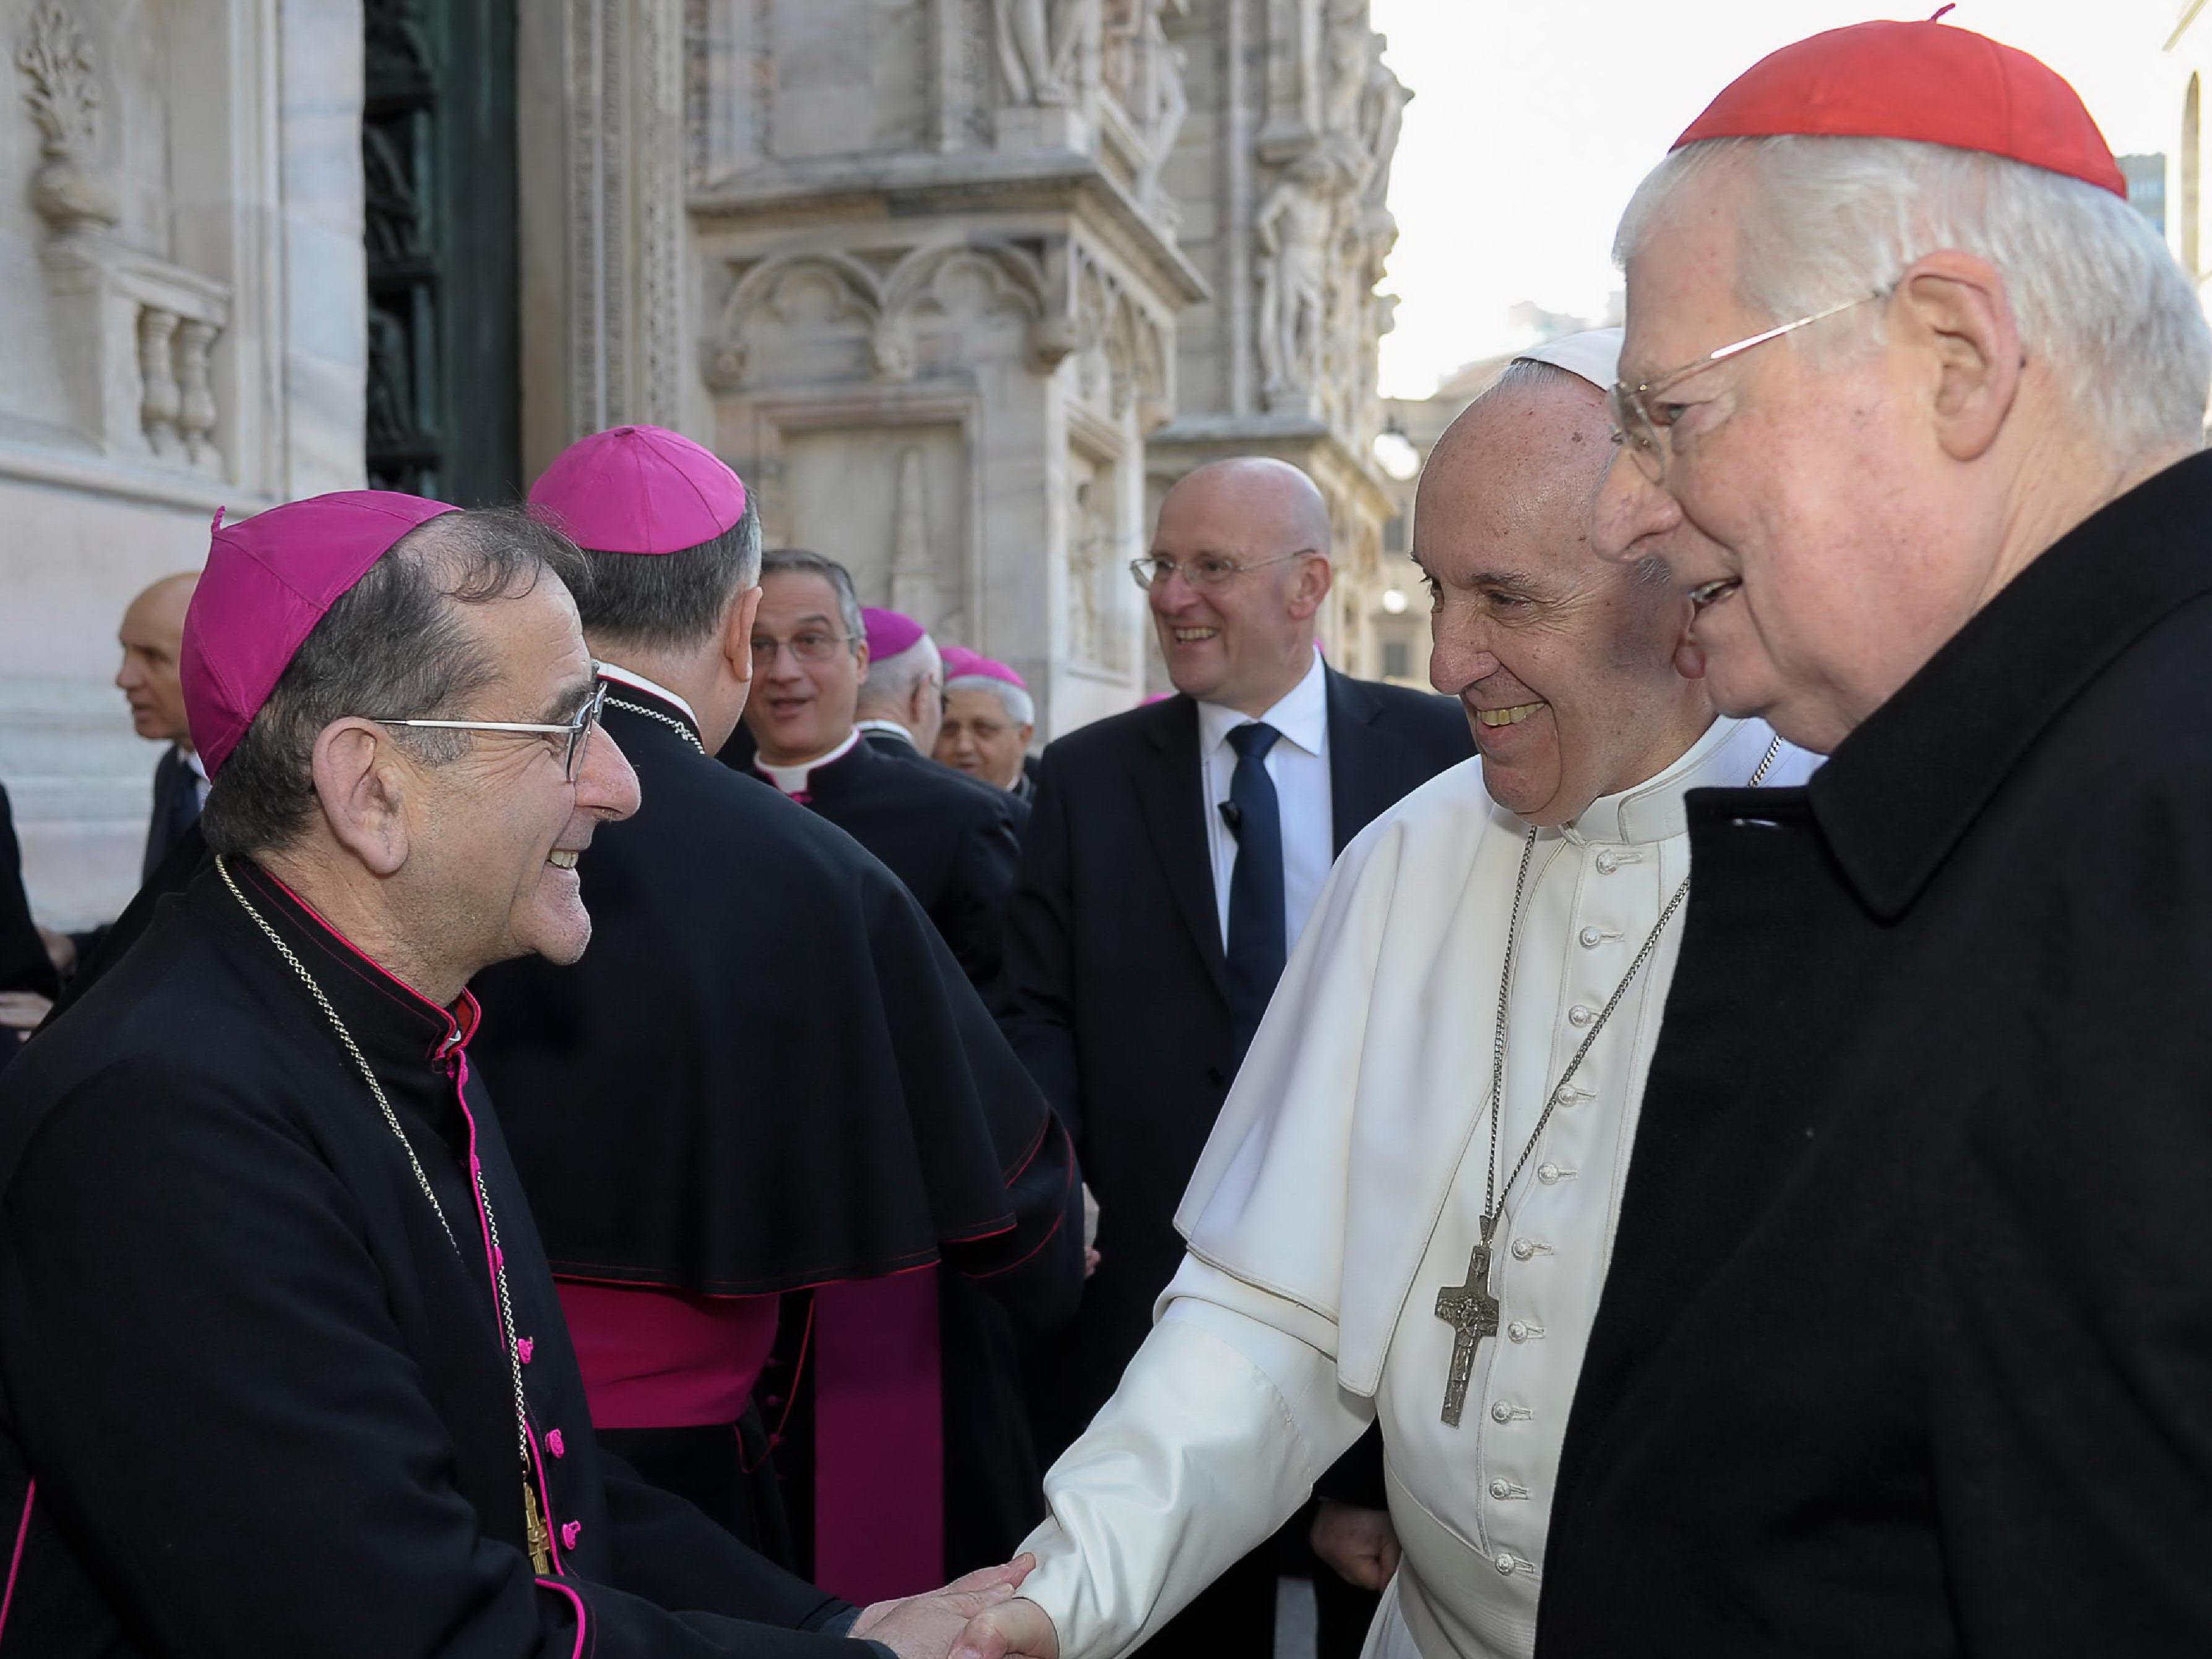 Delpini, papa Francescoe e Scola